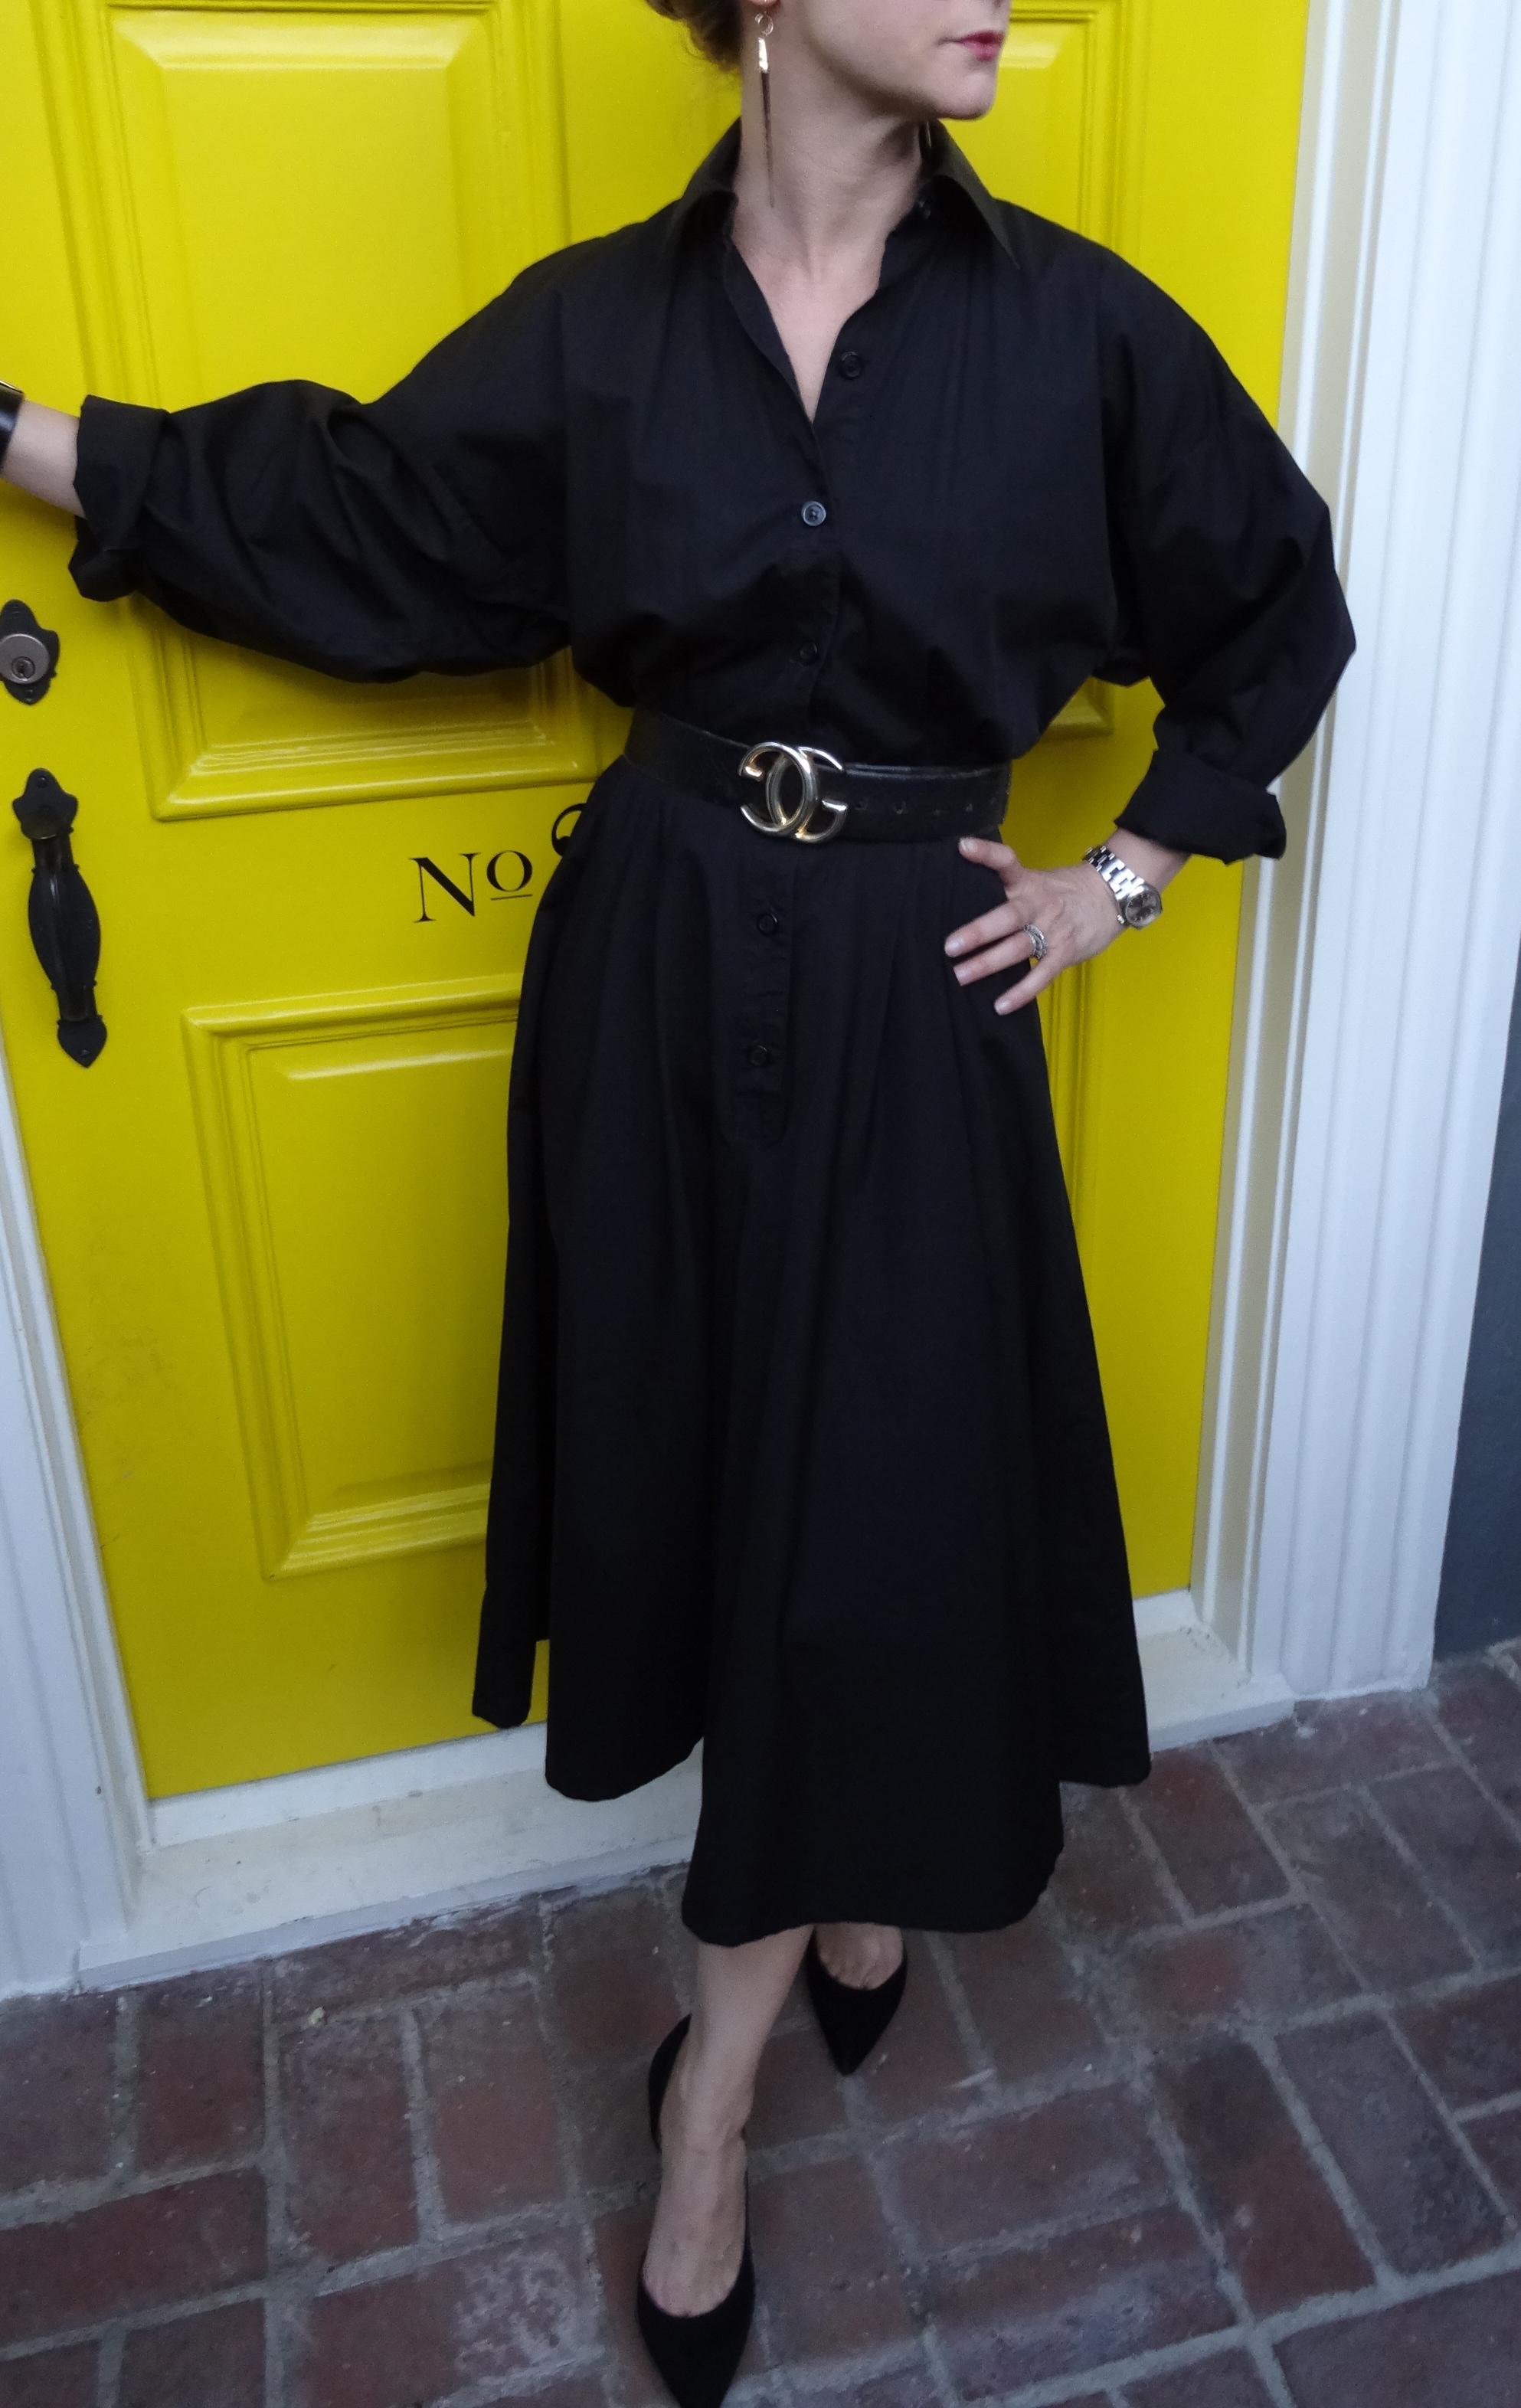 Gucci Belt with Vintage Norma Kamali Dress